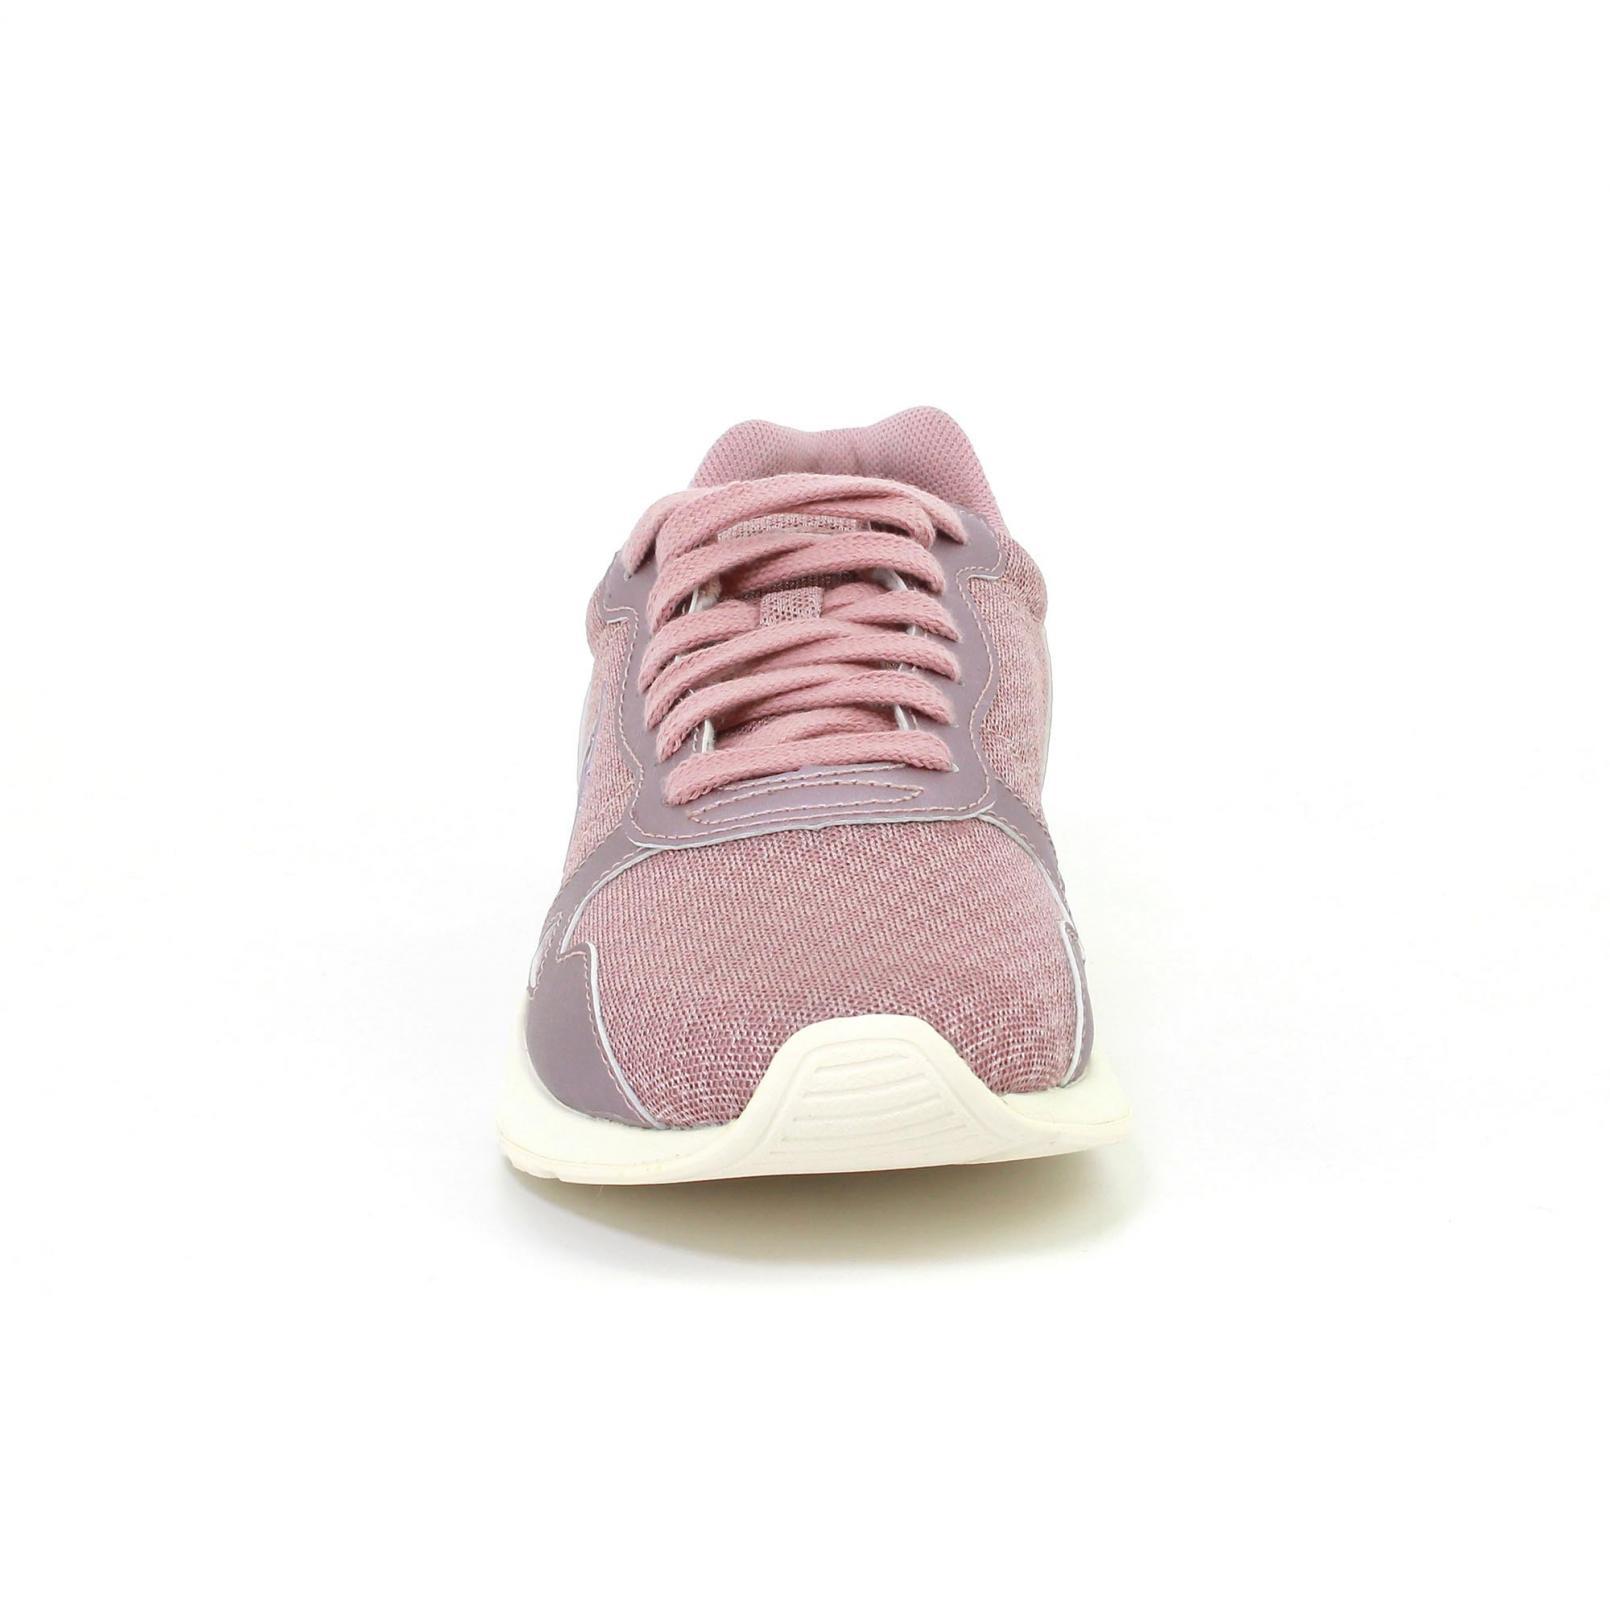 Shoes – Le Coq Sportif Lcs R600 Gs Feminine Mesh/Metallic Pink/Pink